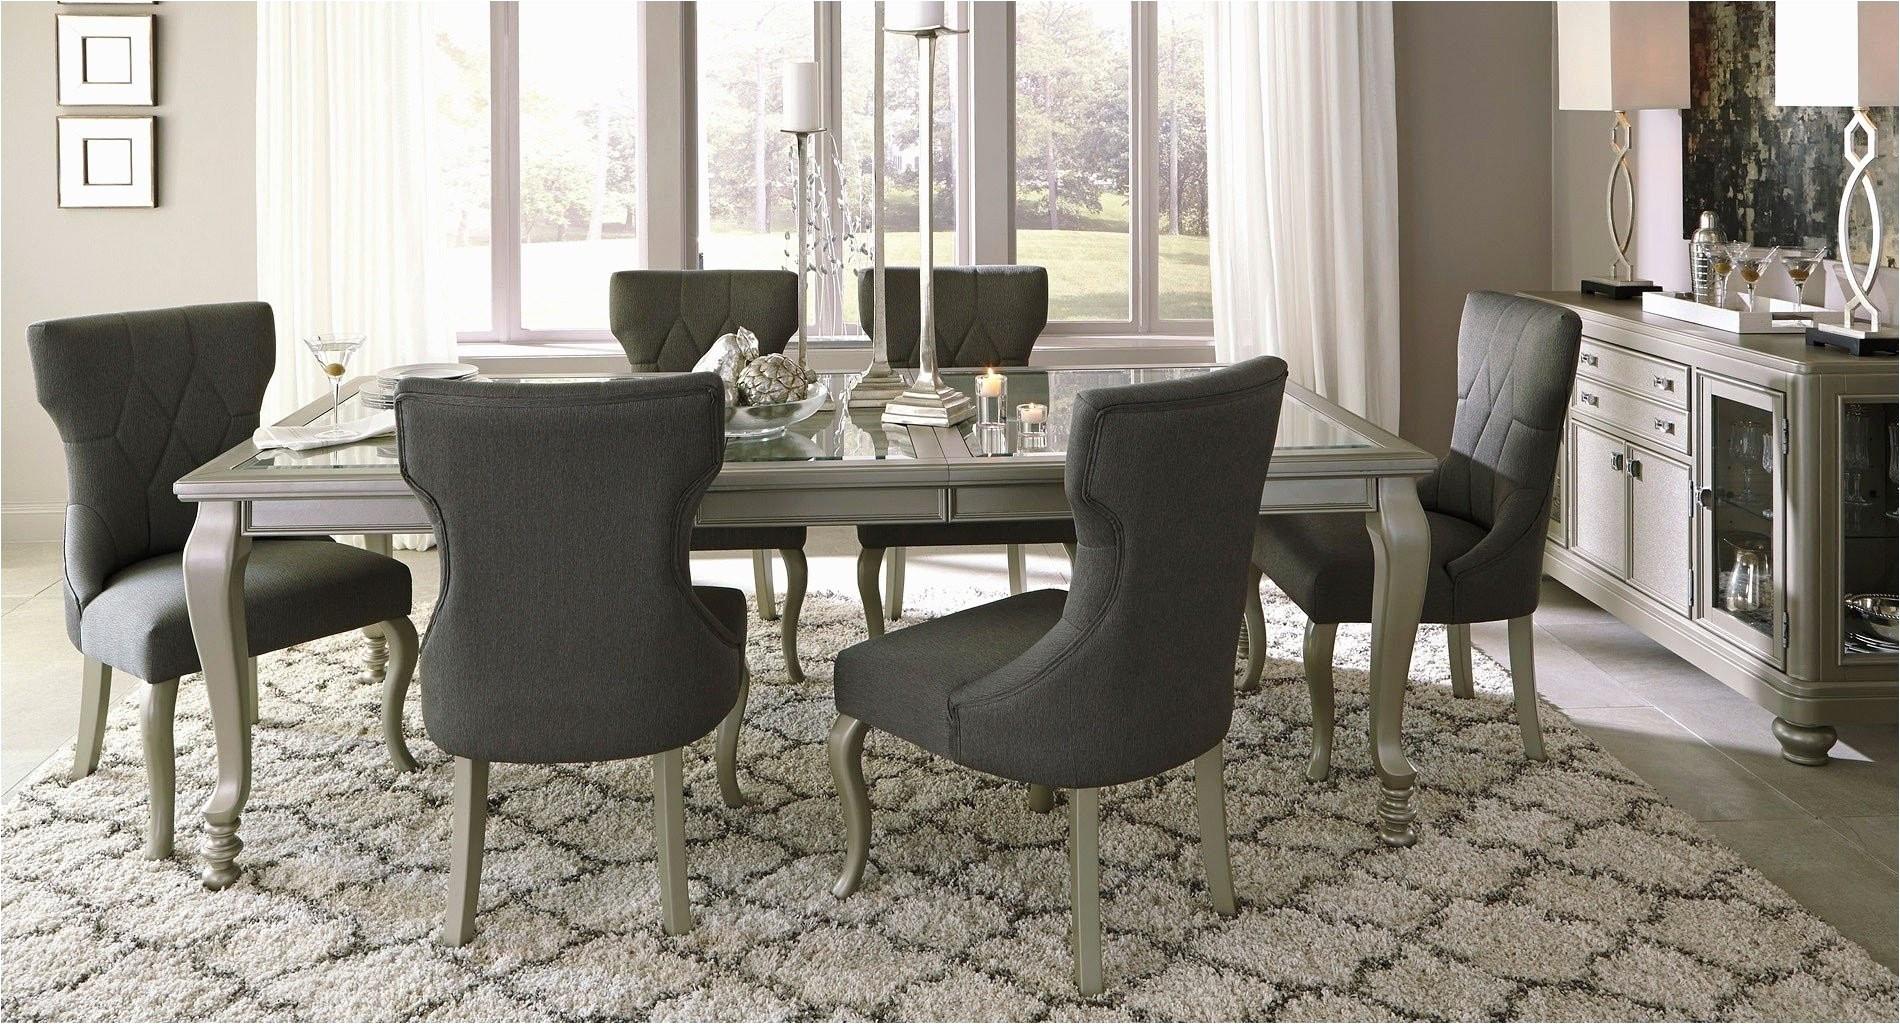 living room furniture sale elegant dining room sets for sale brilliant shaker chairs 0d archives